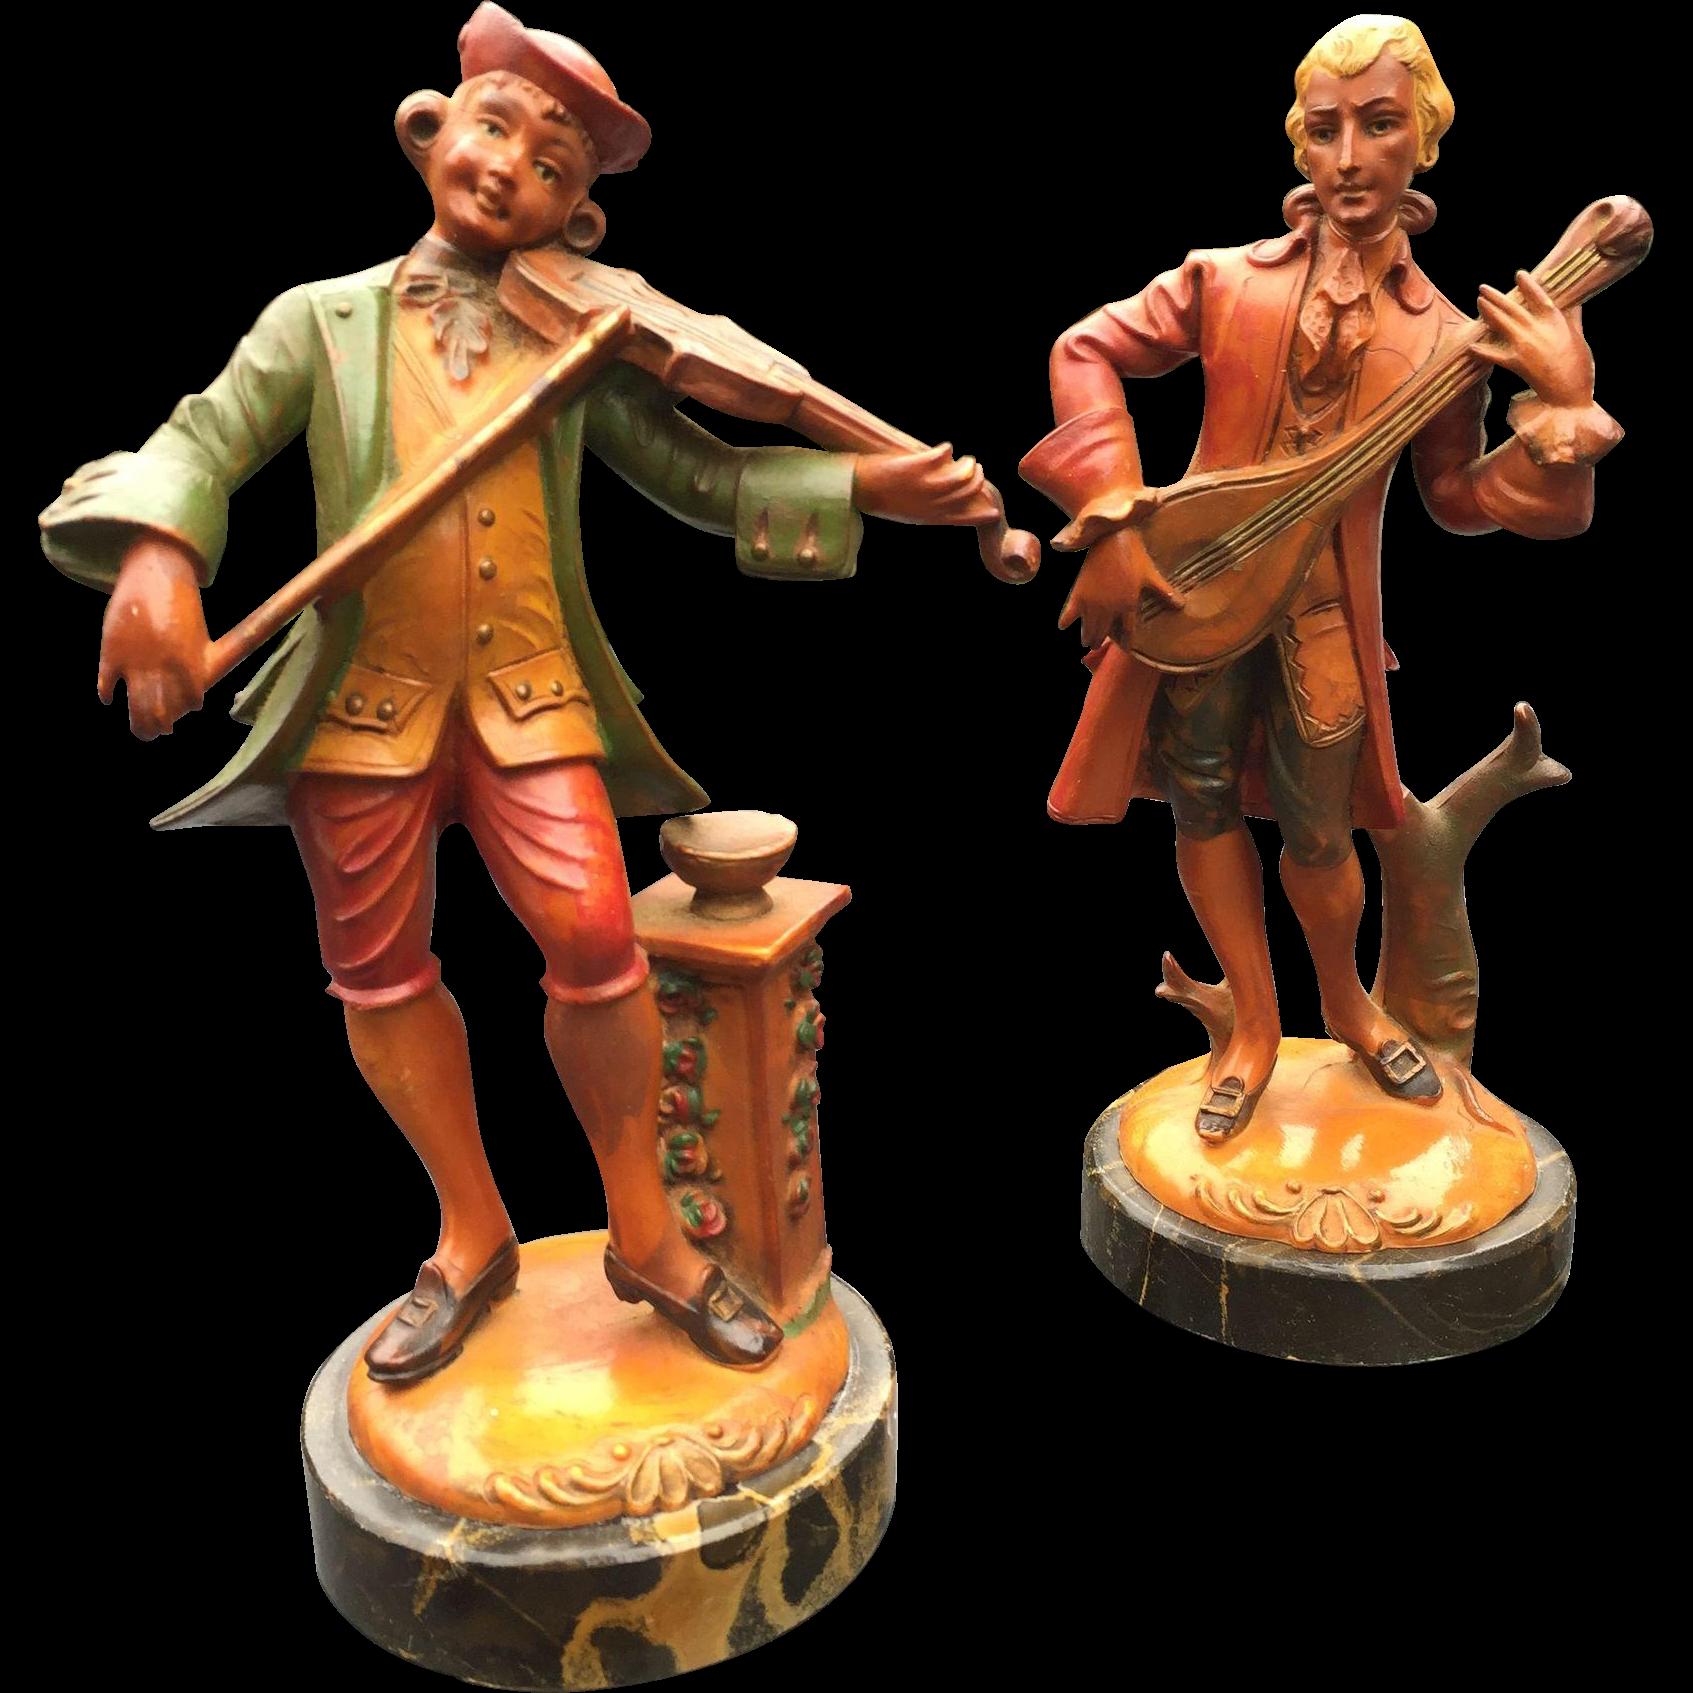 Pair Musician Statue - Sculpture, Violinist